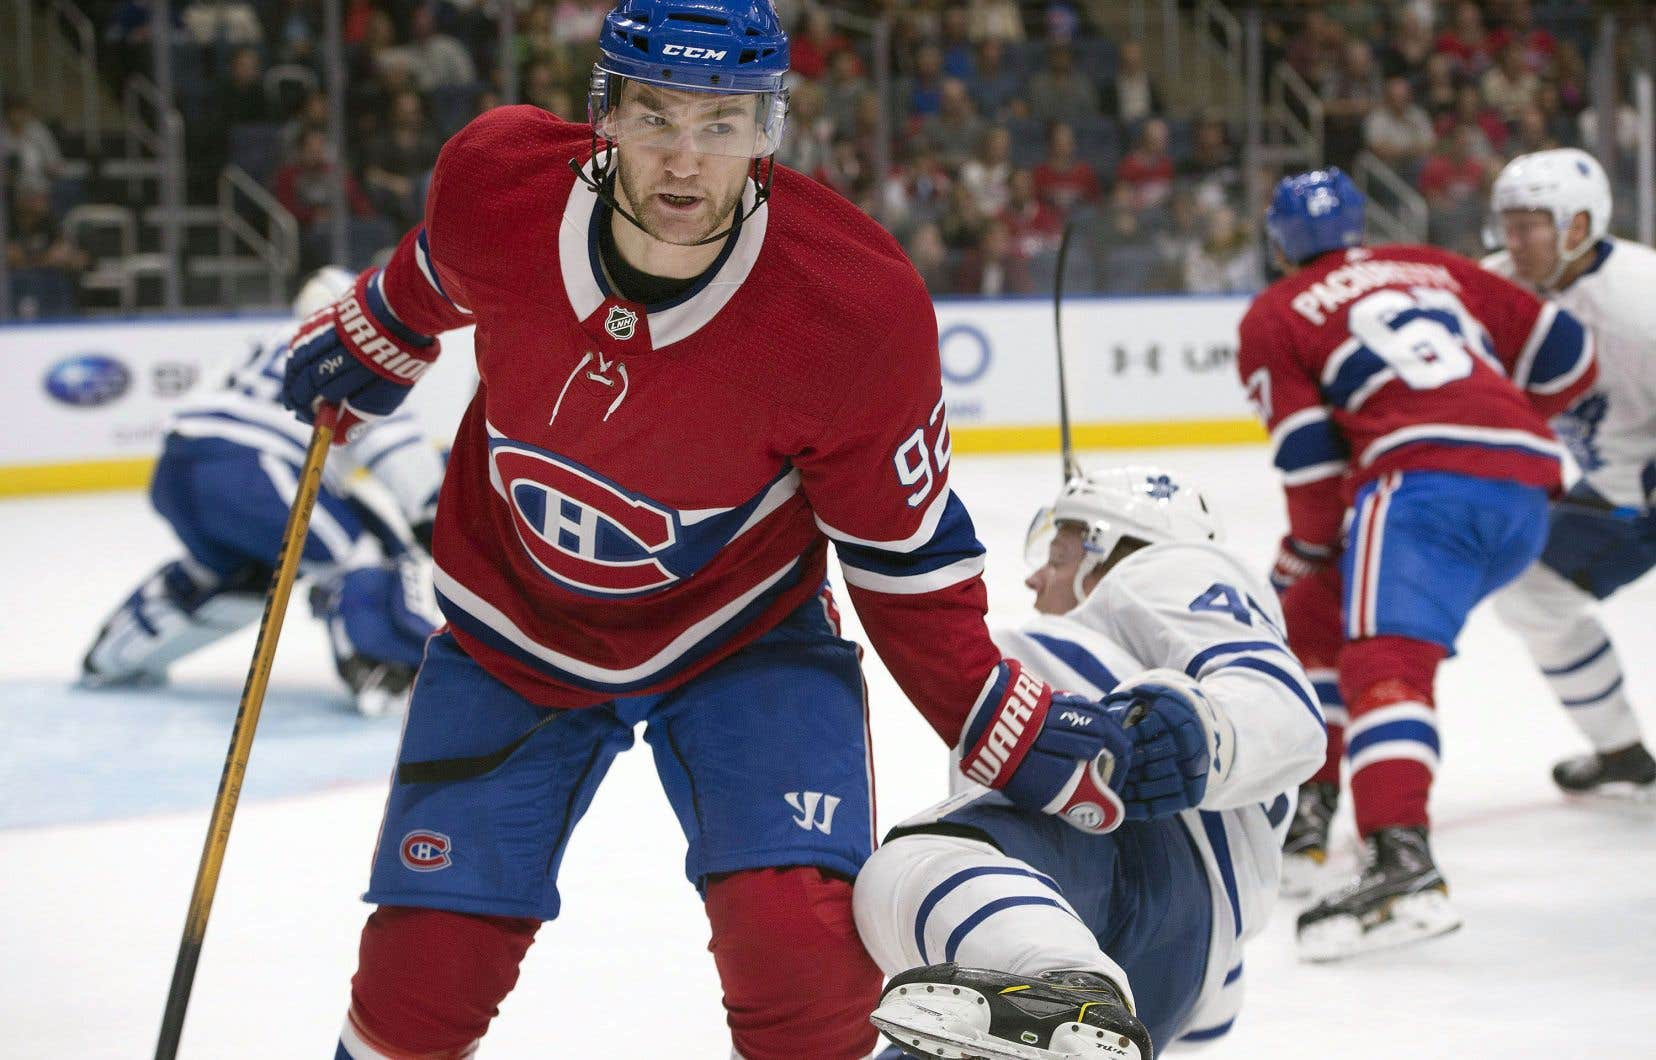 Jonathan Drouin ressort vainqueur du duel contre Miro Aaltonen lors de la rencontre du Canadien contre les Maple Leafs de Toronto, à Québec, mercredi.